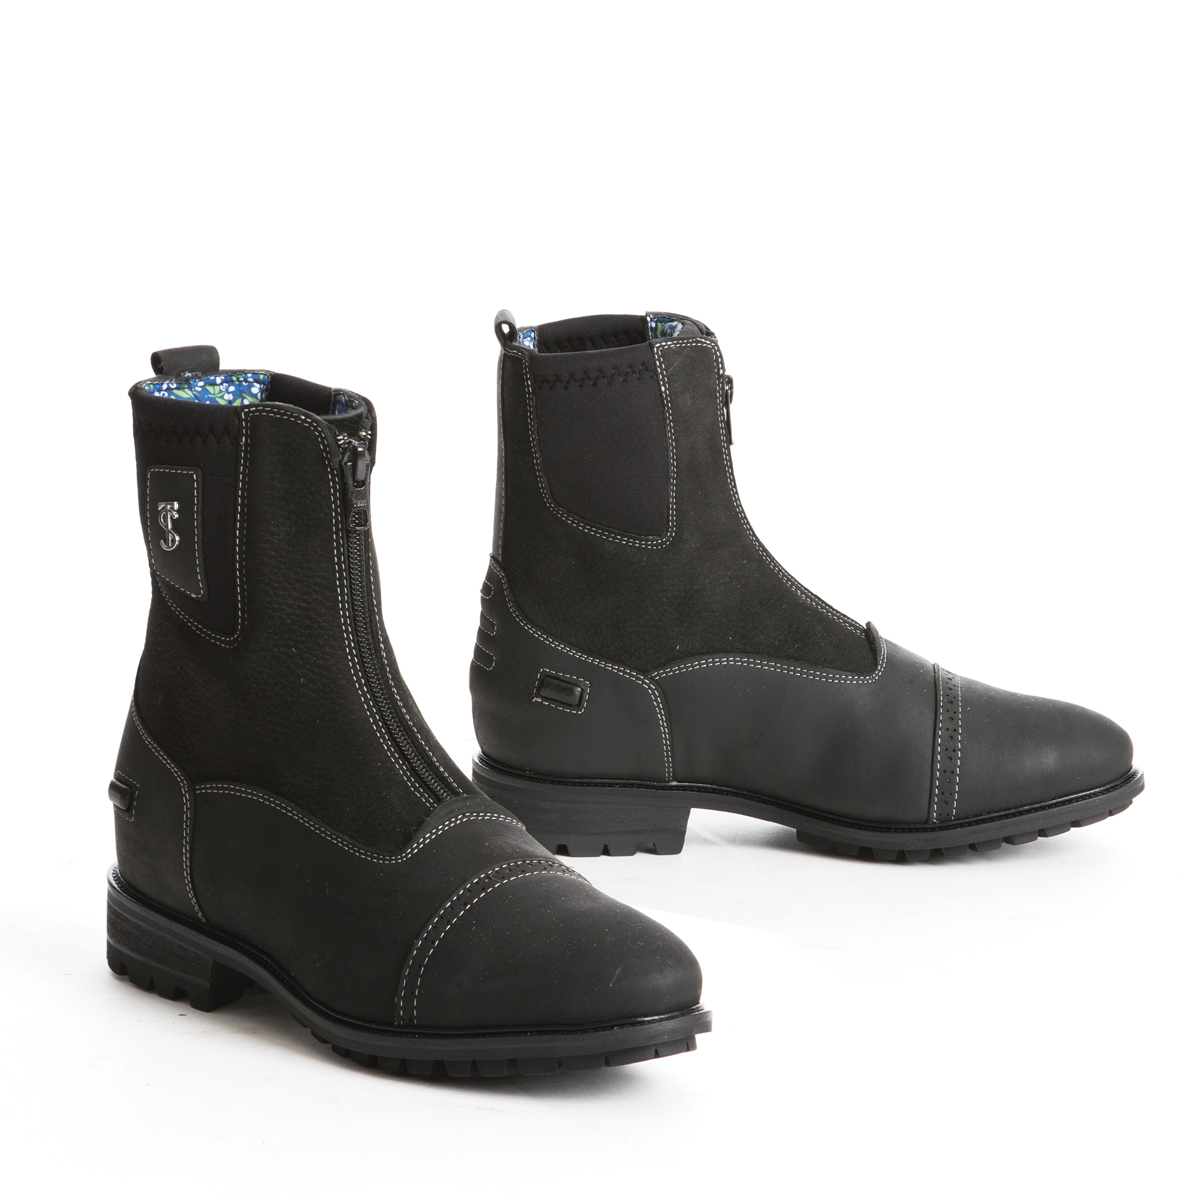 Tredstep Spirit Front Zip Boots